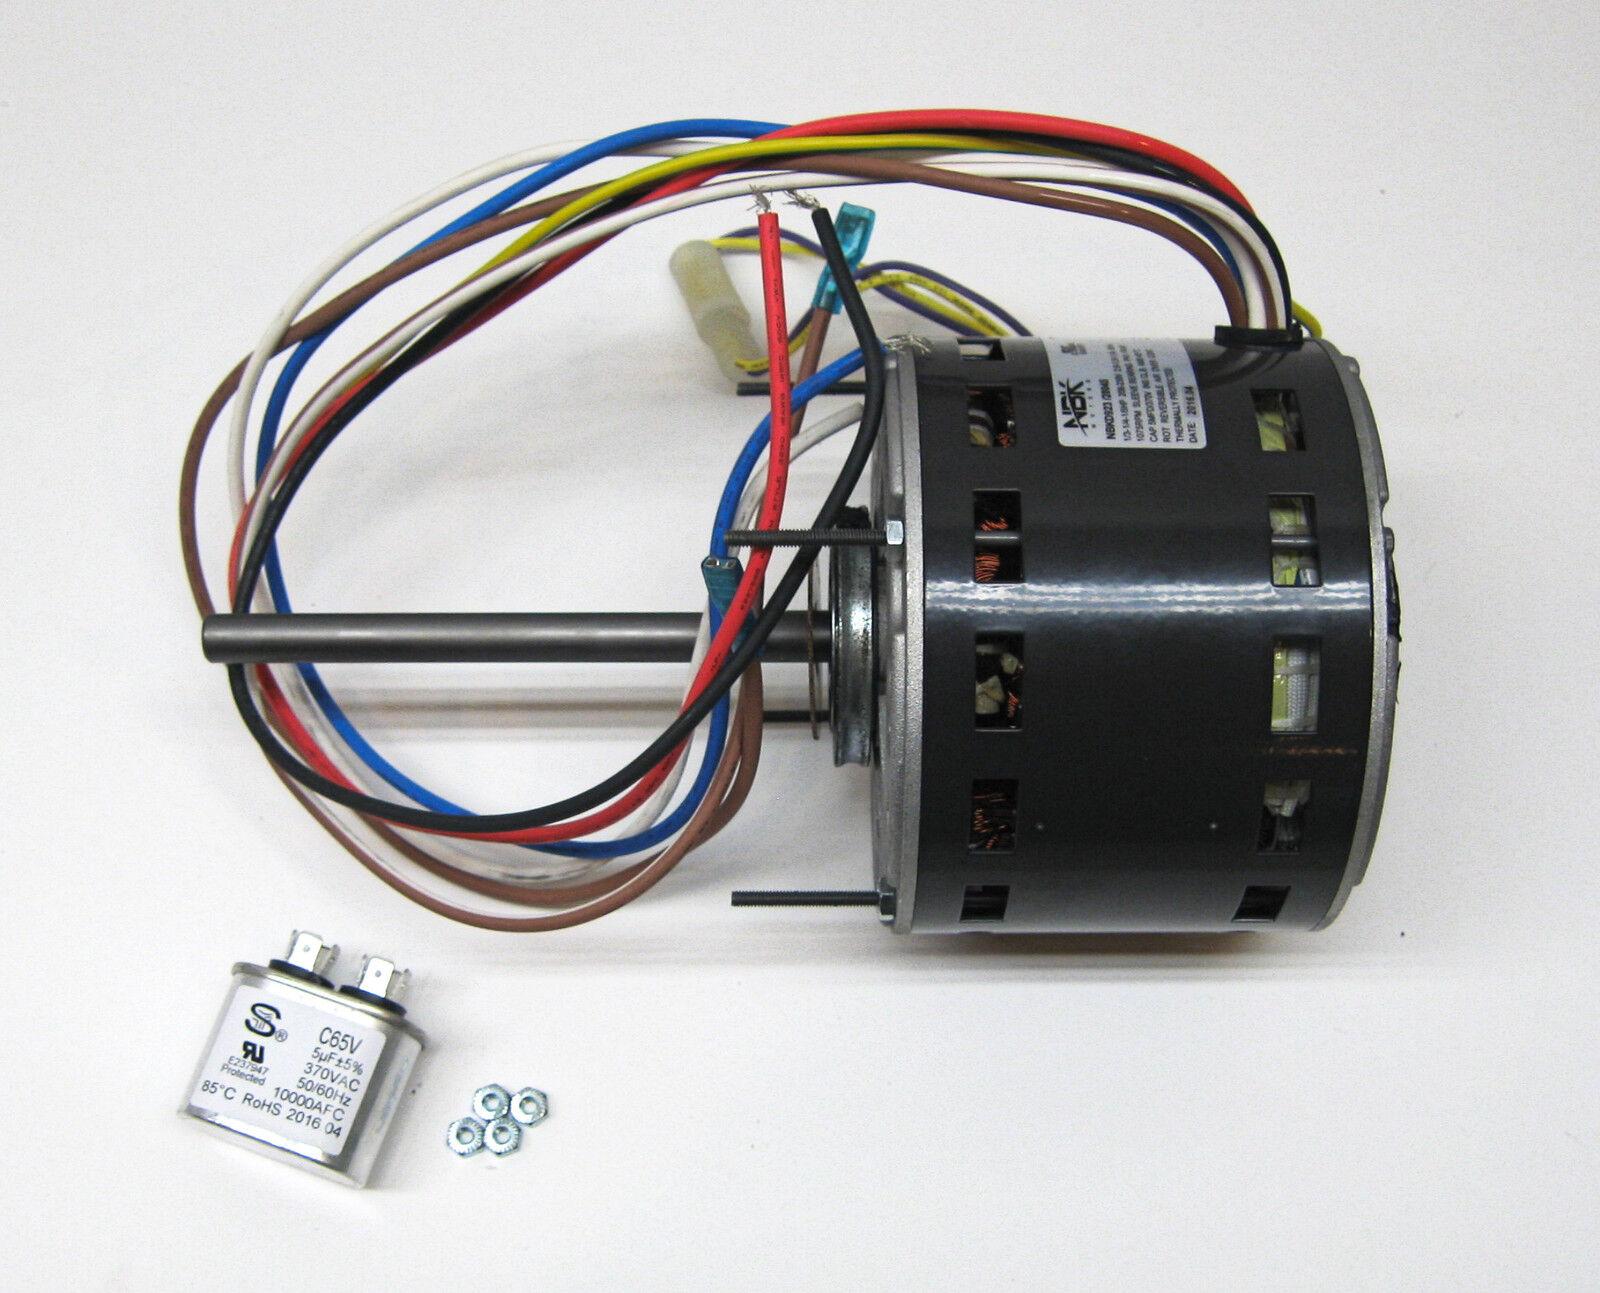 hight resolution of mars 10586 wiring diagram wiring library genteq motor wiring diagram 10586 mars motor wiring diagram